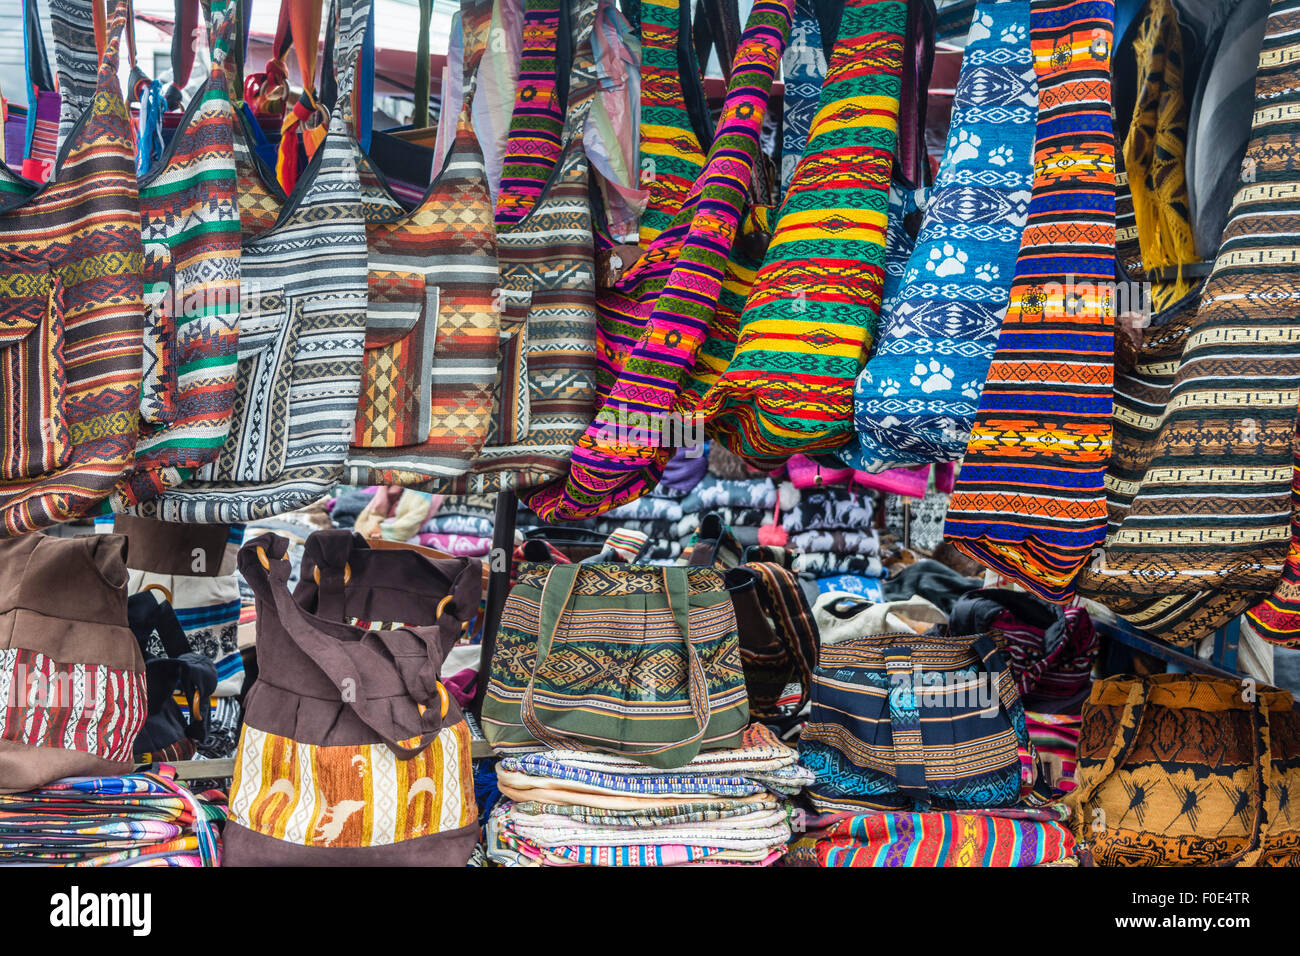 Colorful bags hanging at souvenier shop in Otavalo, Ecuador - Stock Image